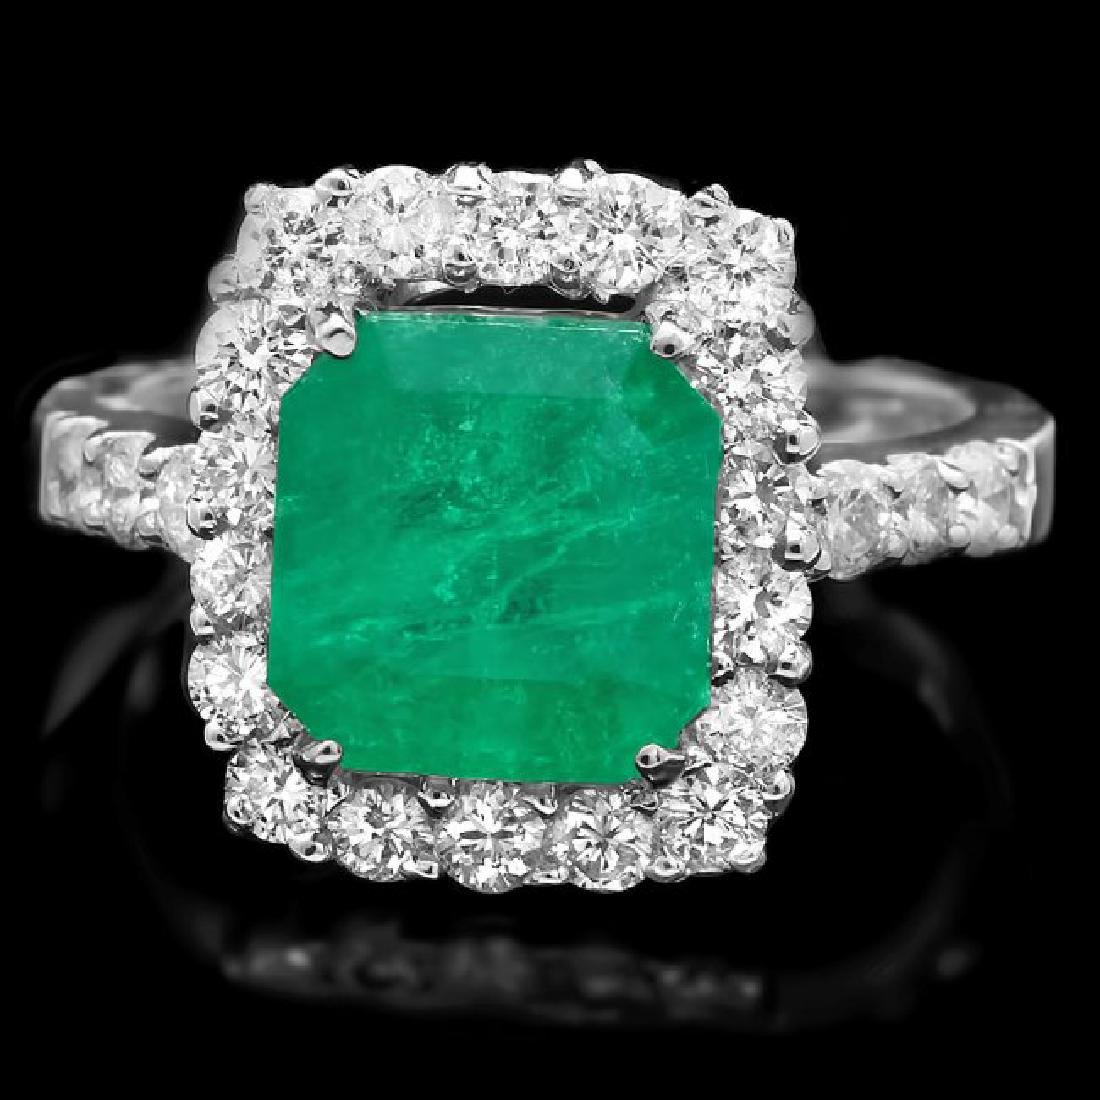 14k White Gold 3.70ct Emerald 1.10ct Diamond Ring